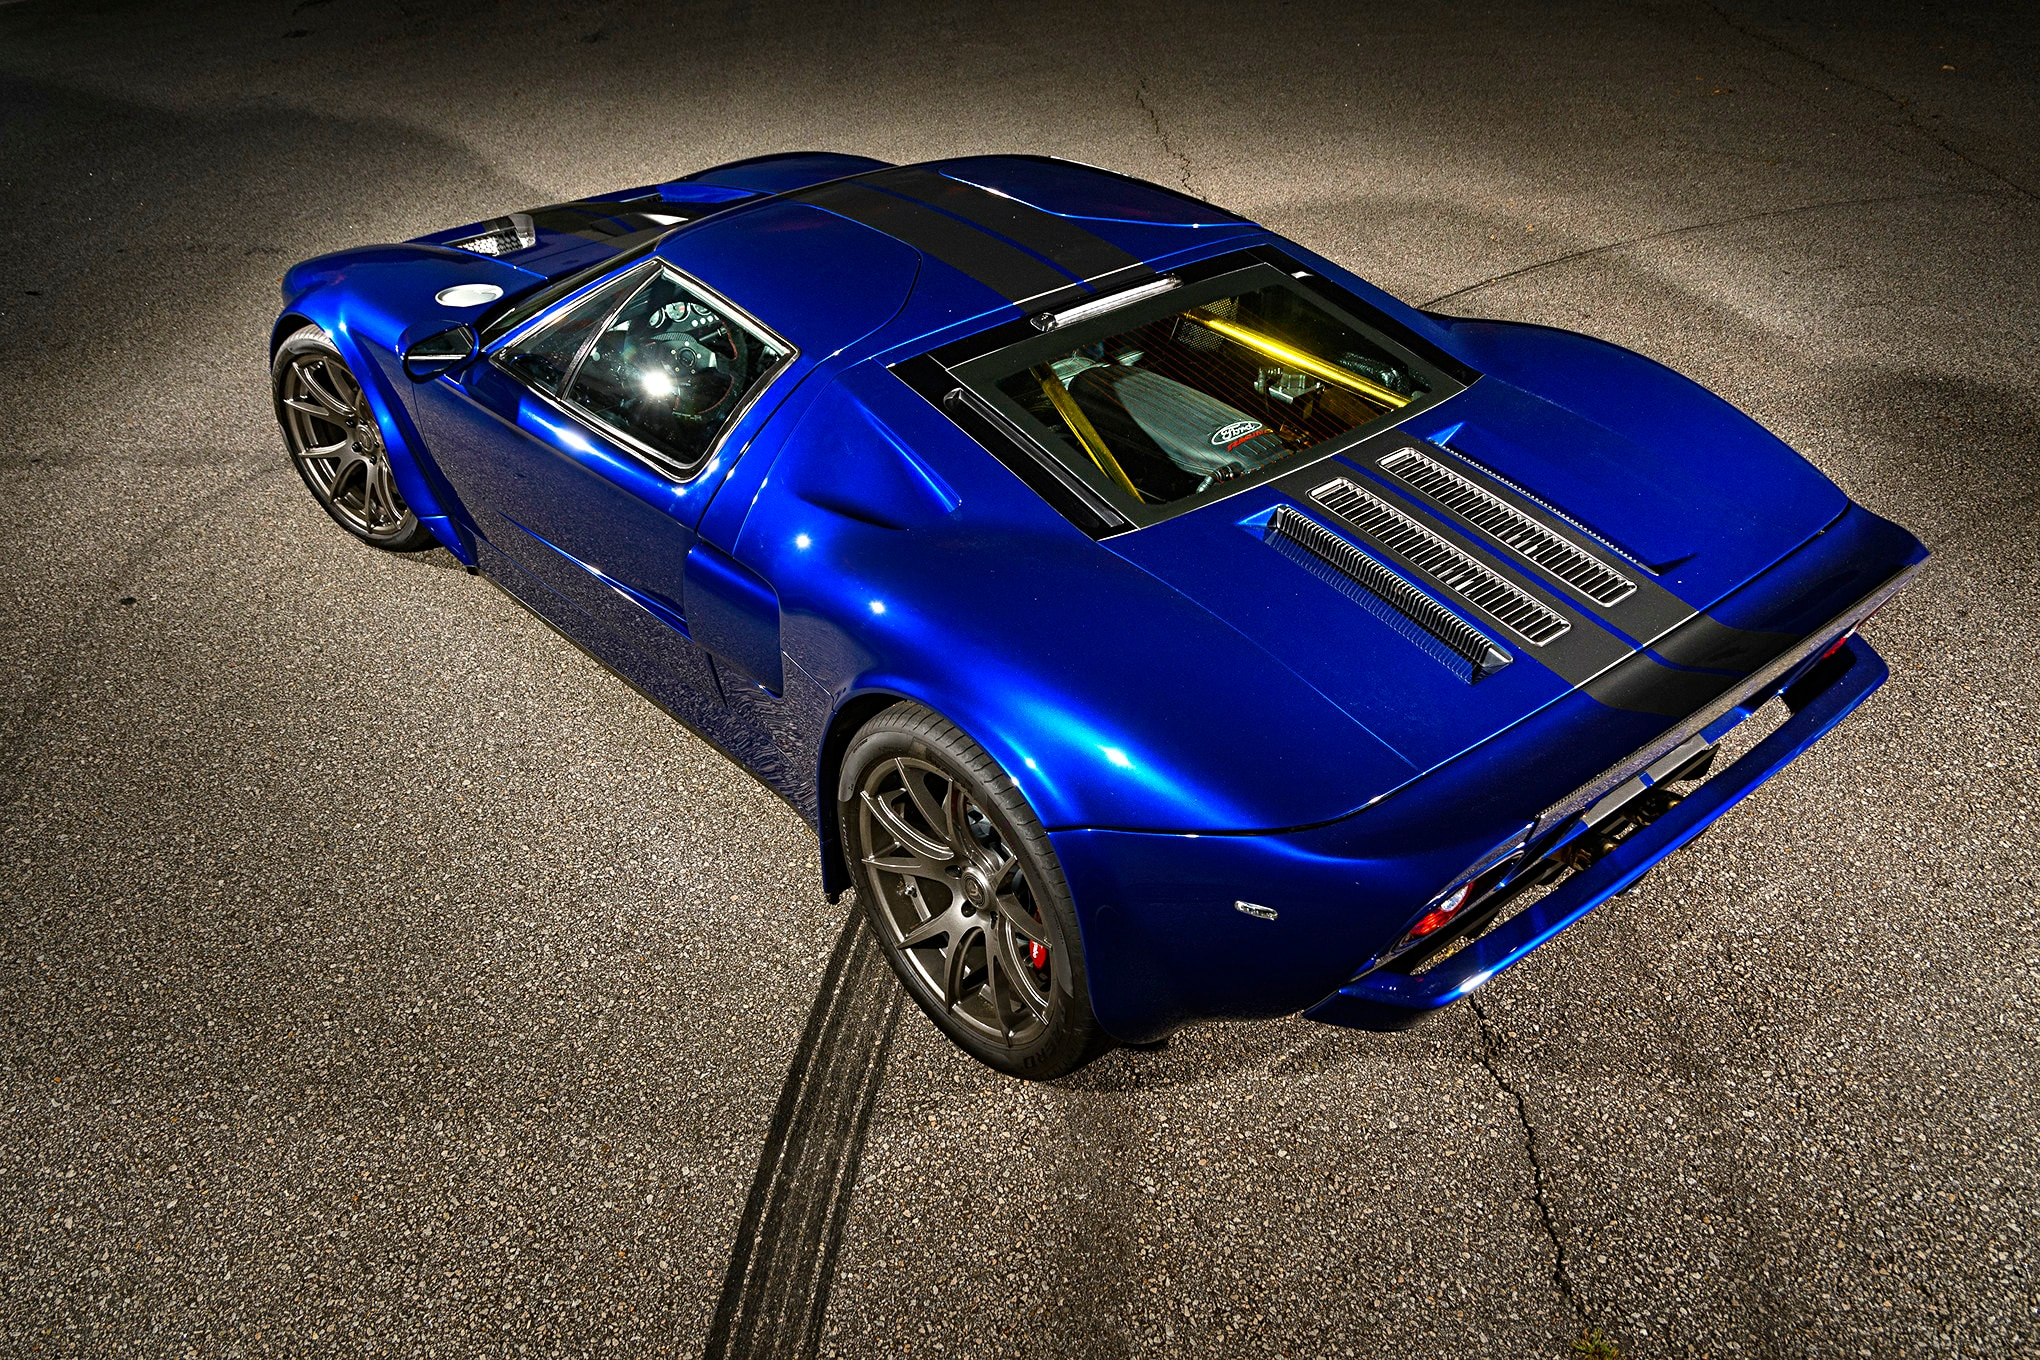 007-Superlite-GT-R-rear-side.jpg